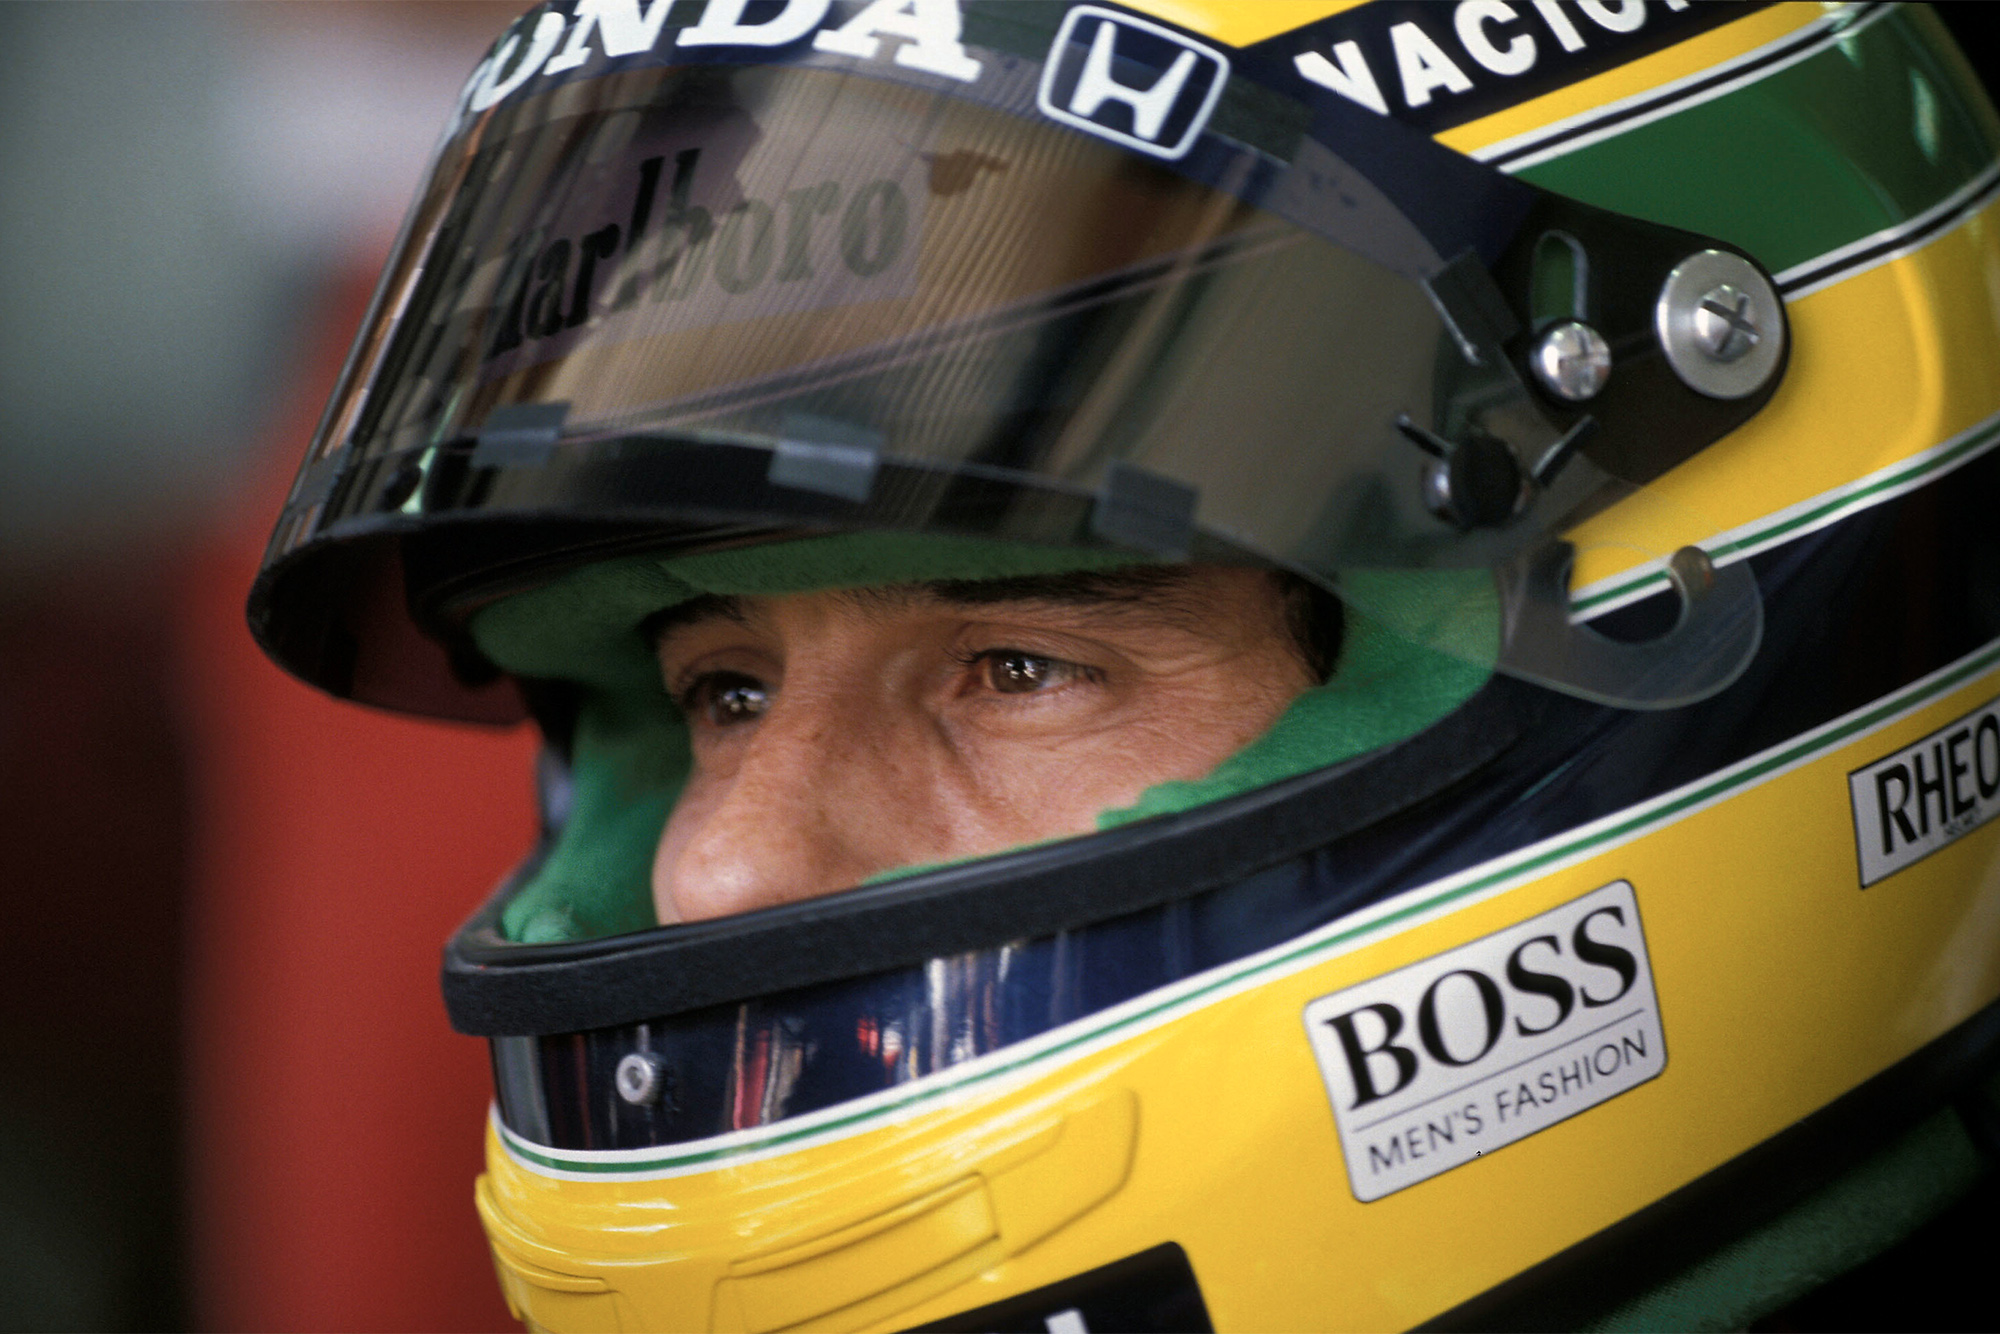 Ayrton Senna during the 1990 Formula 1 season